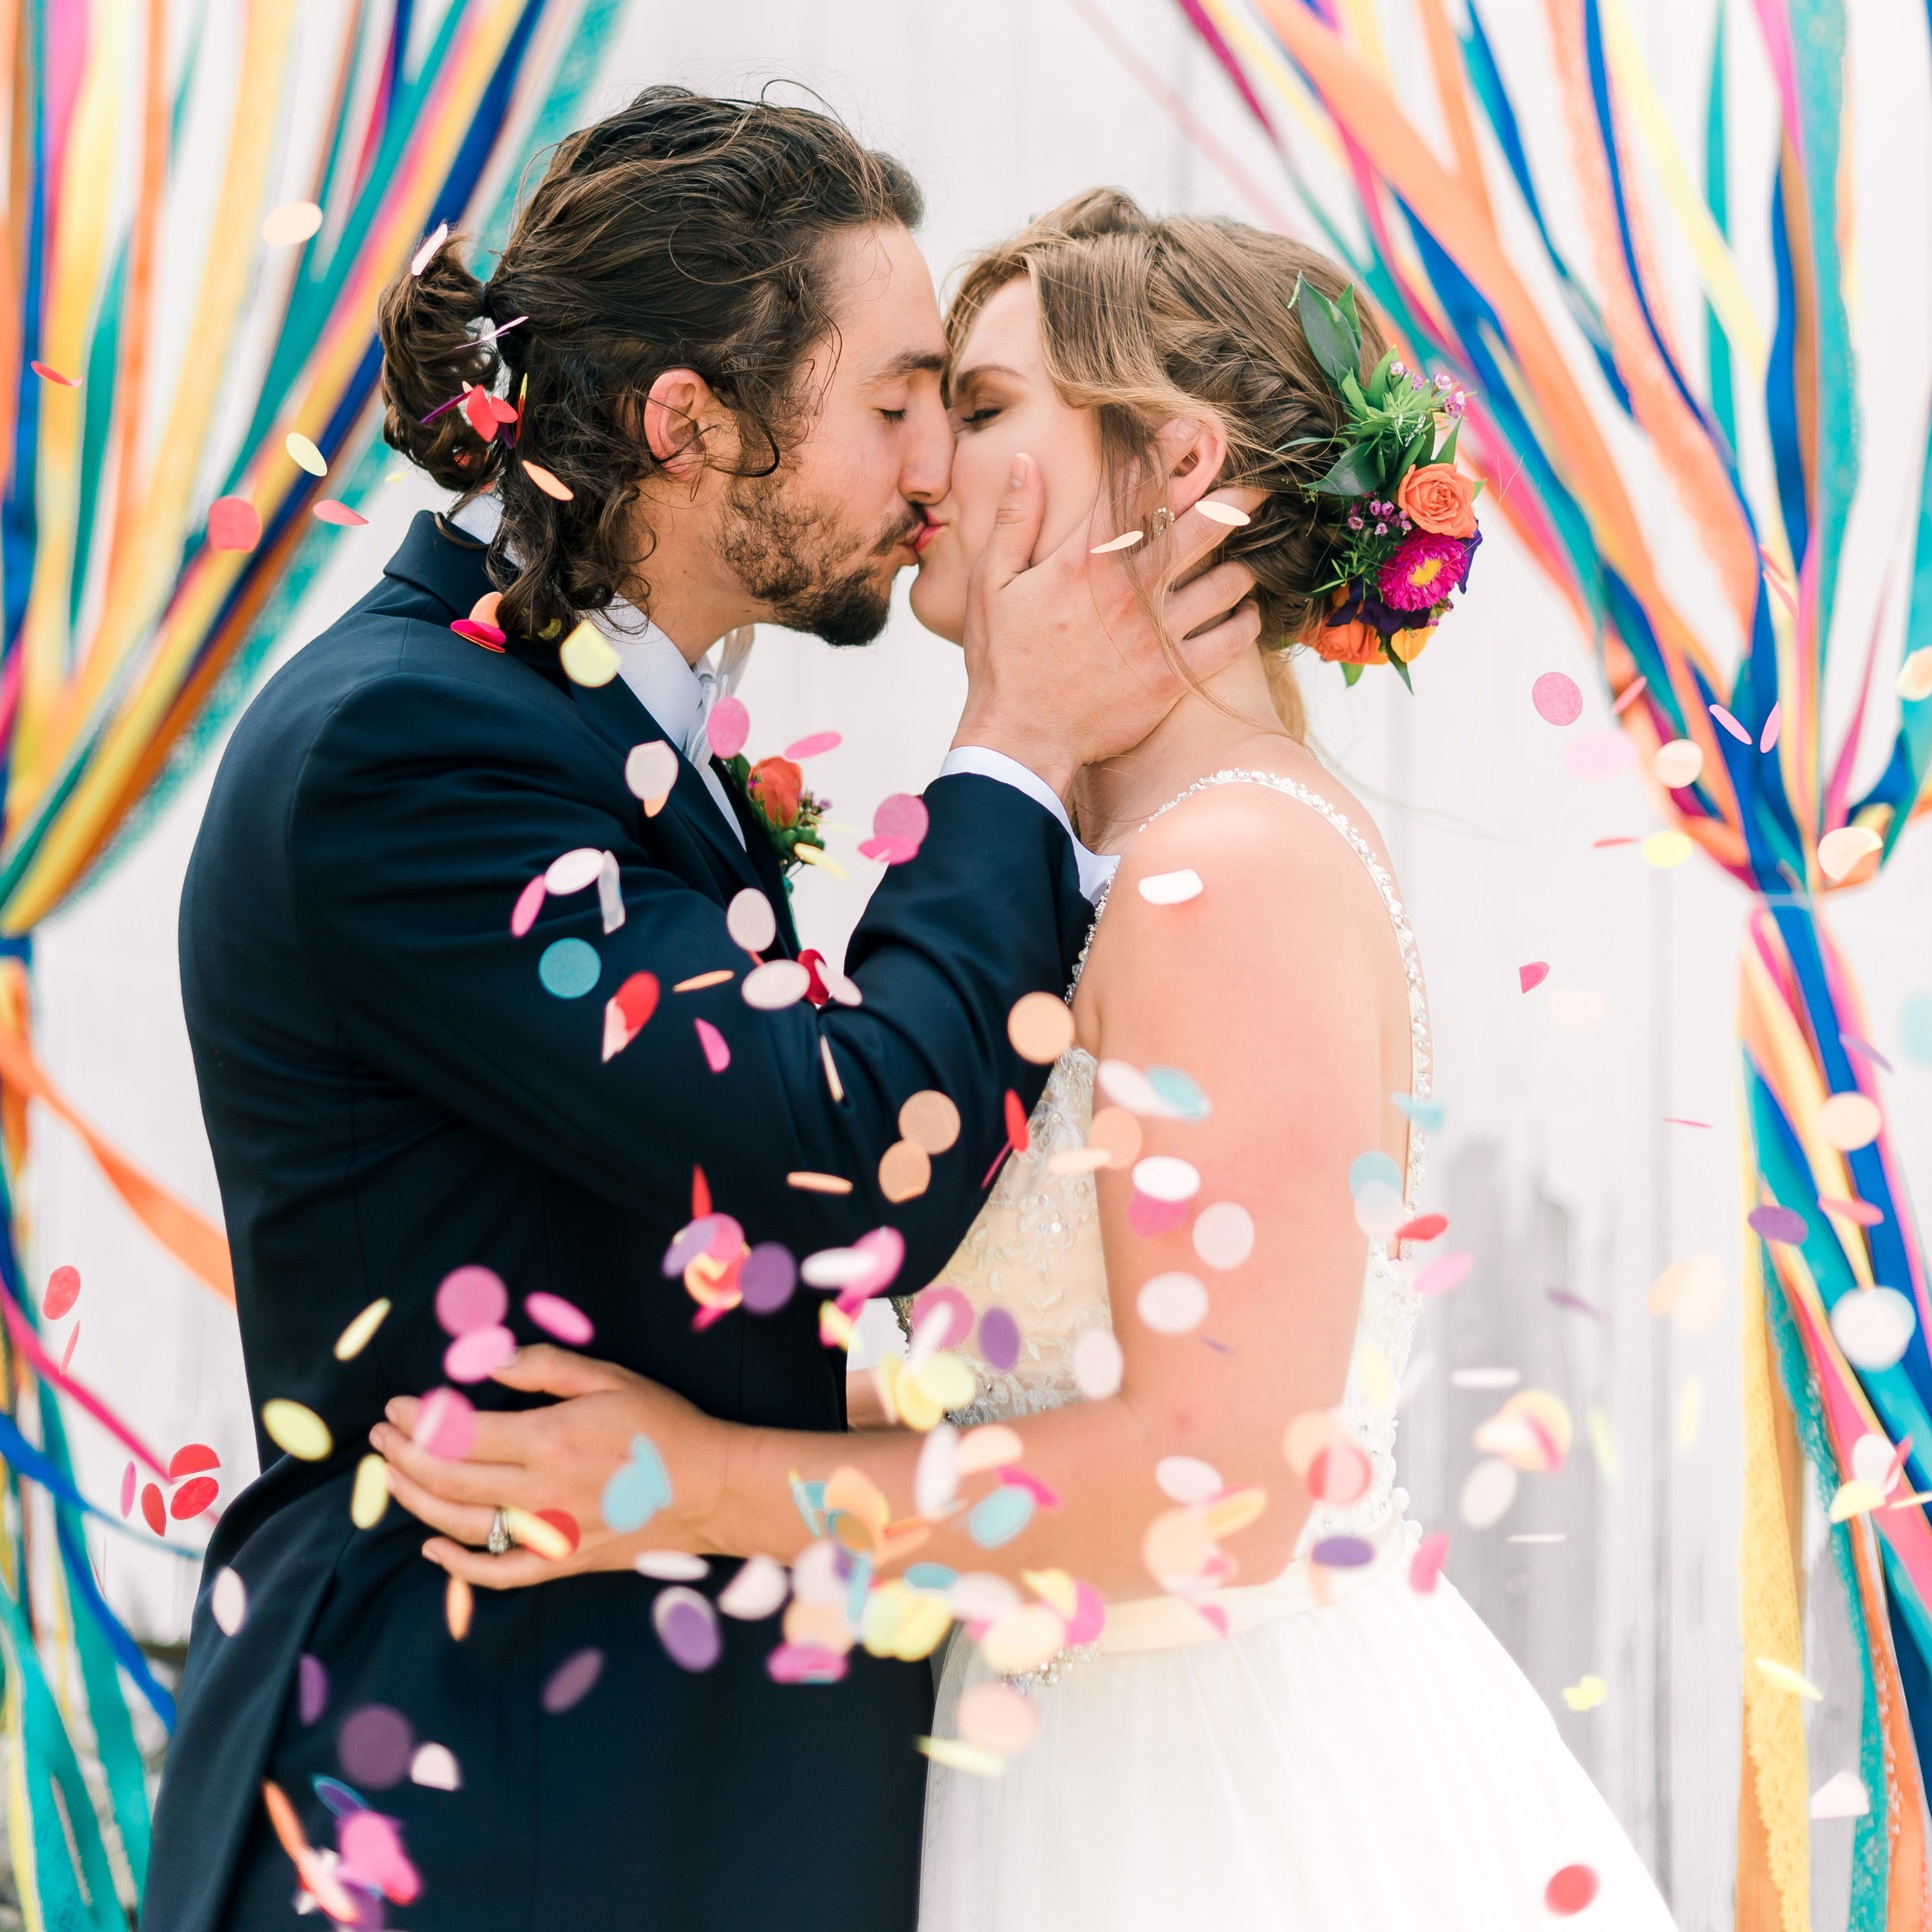 K-Flowers-Designs-Colorful-Wedding-Inspiration.jpg